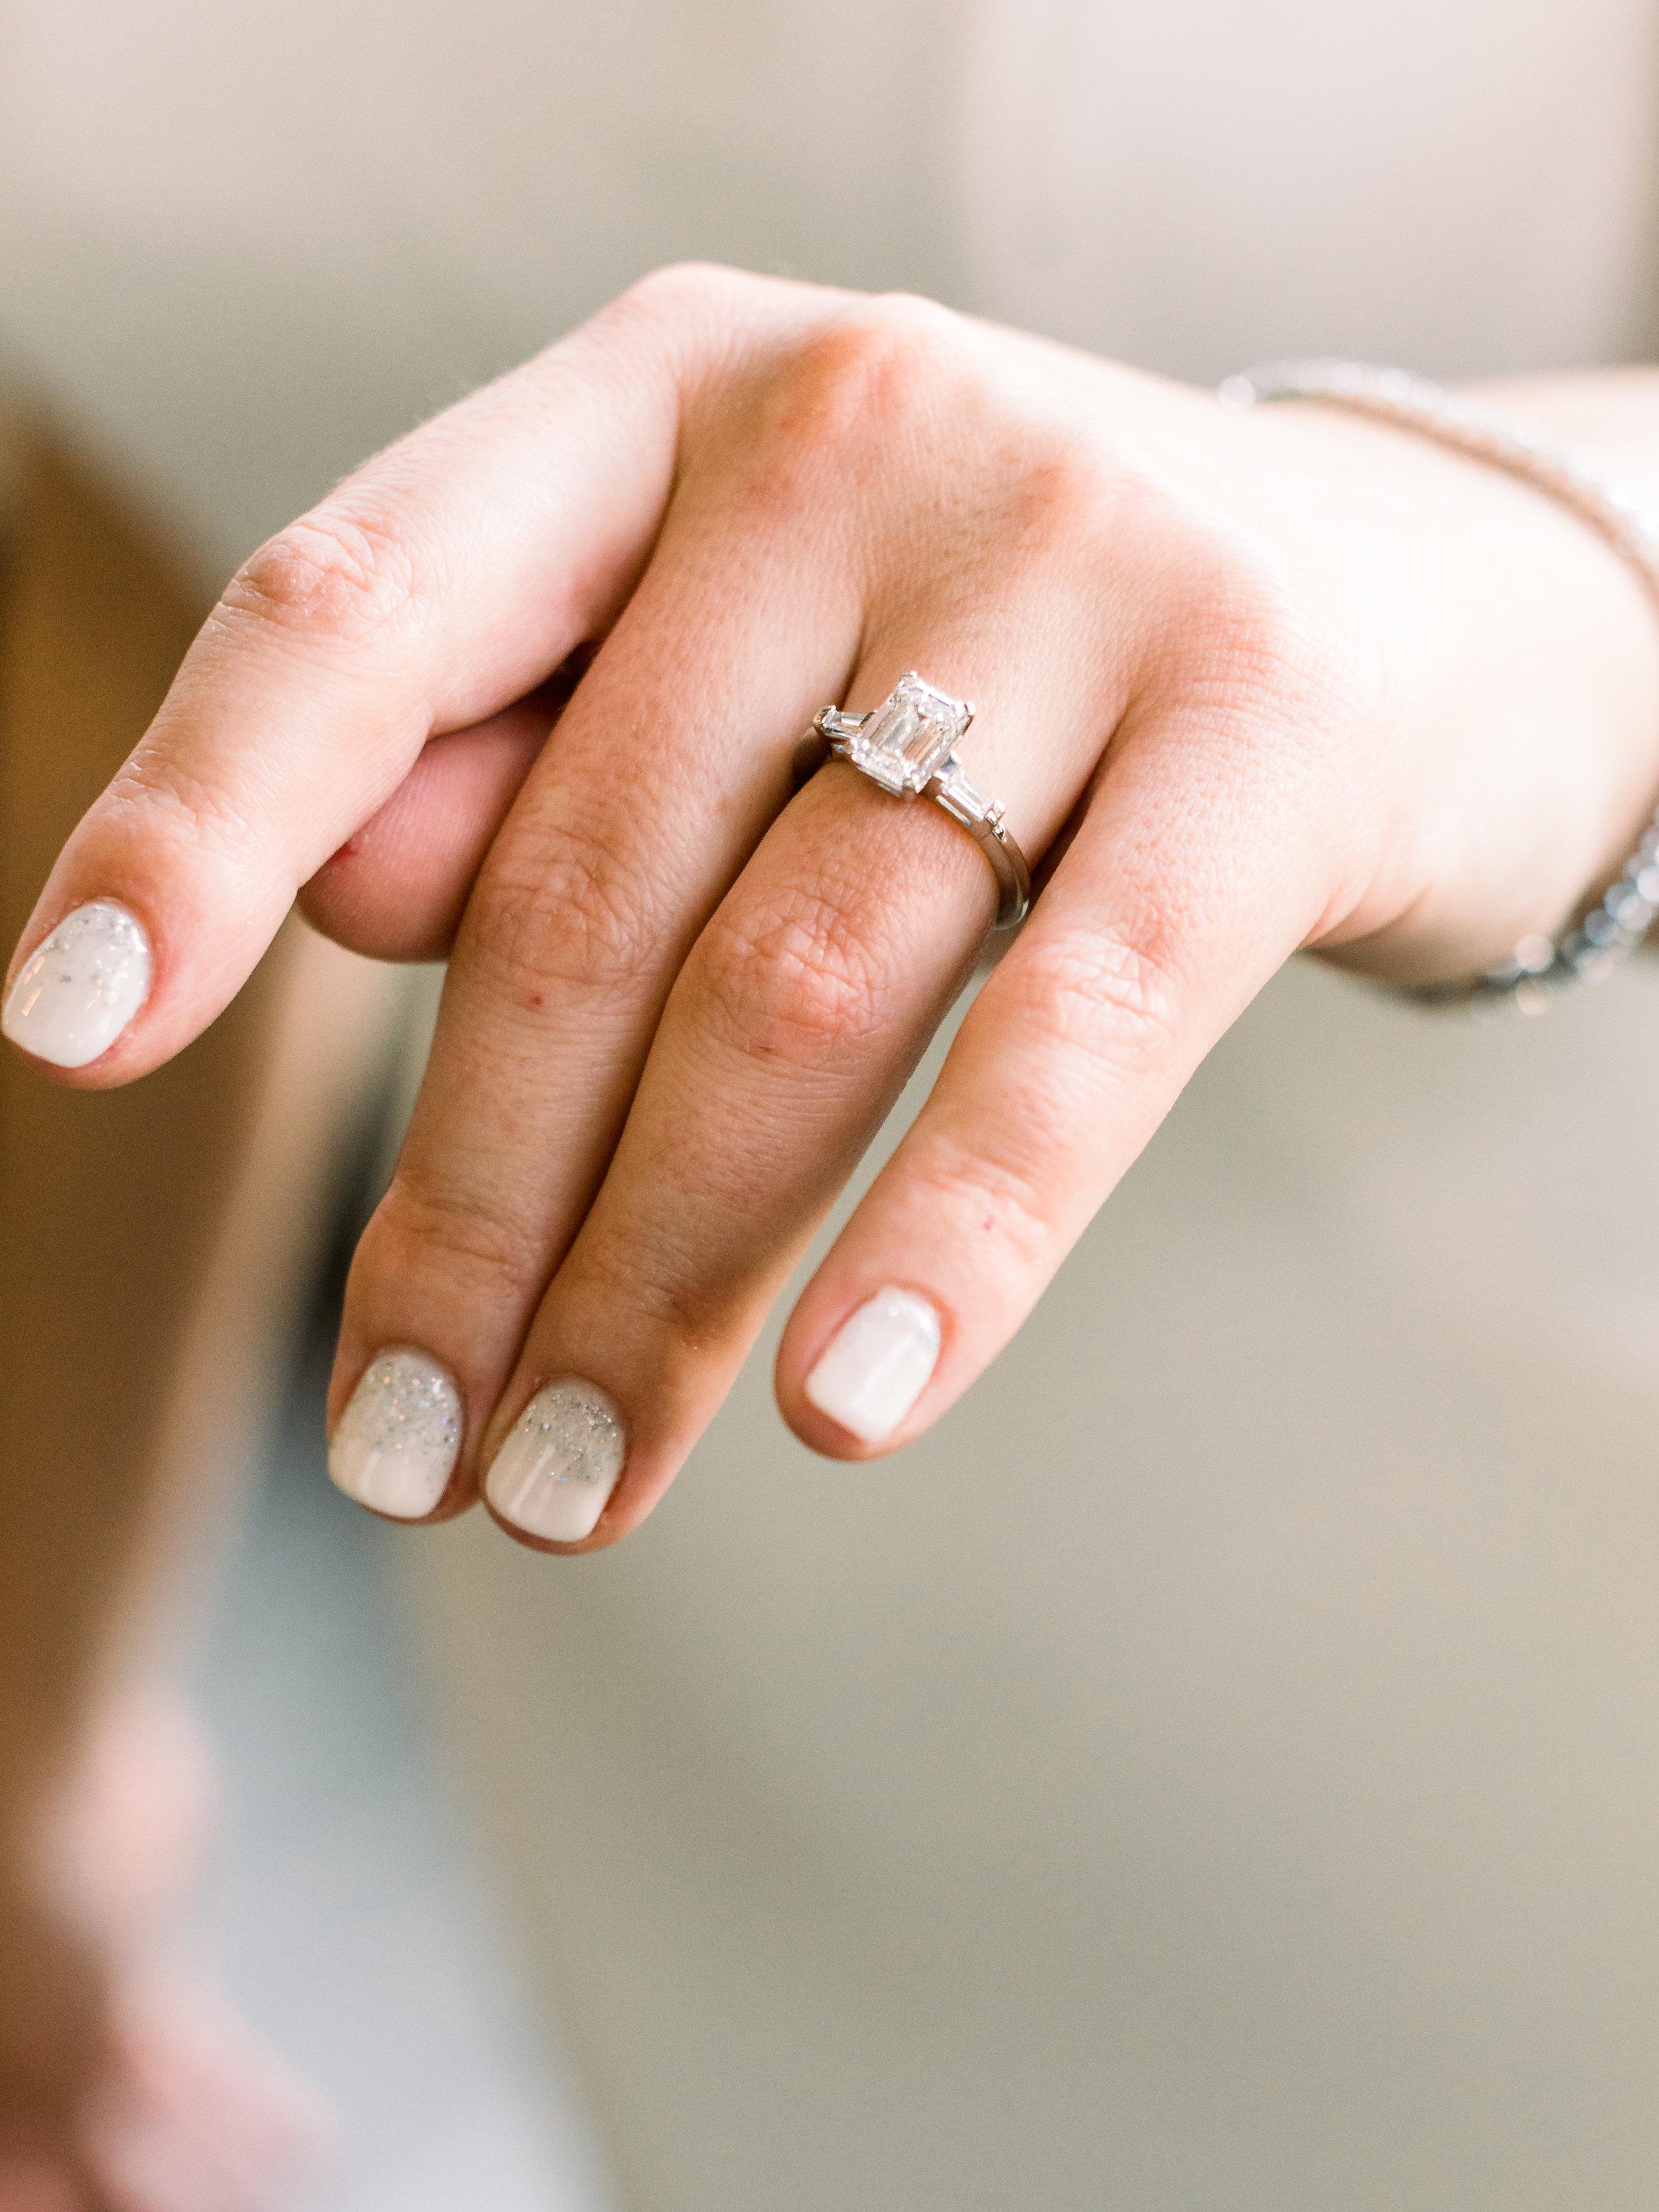 bride-showing-off-her-wedding-ring.jpg